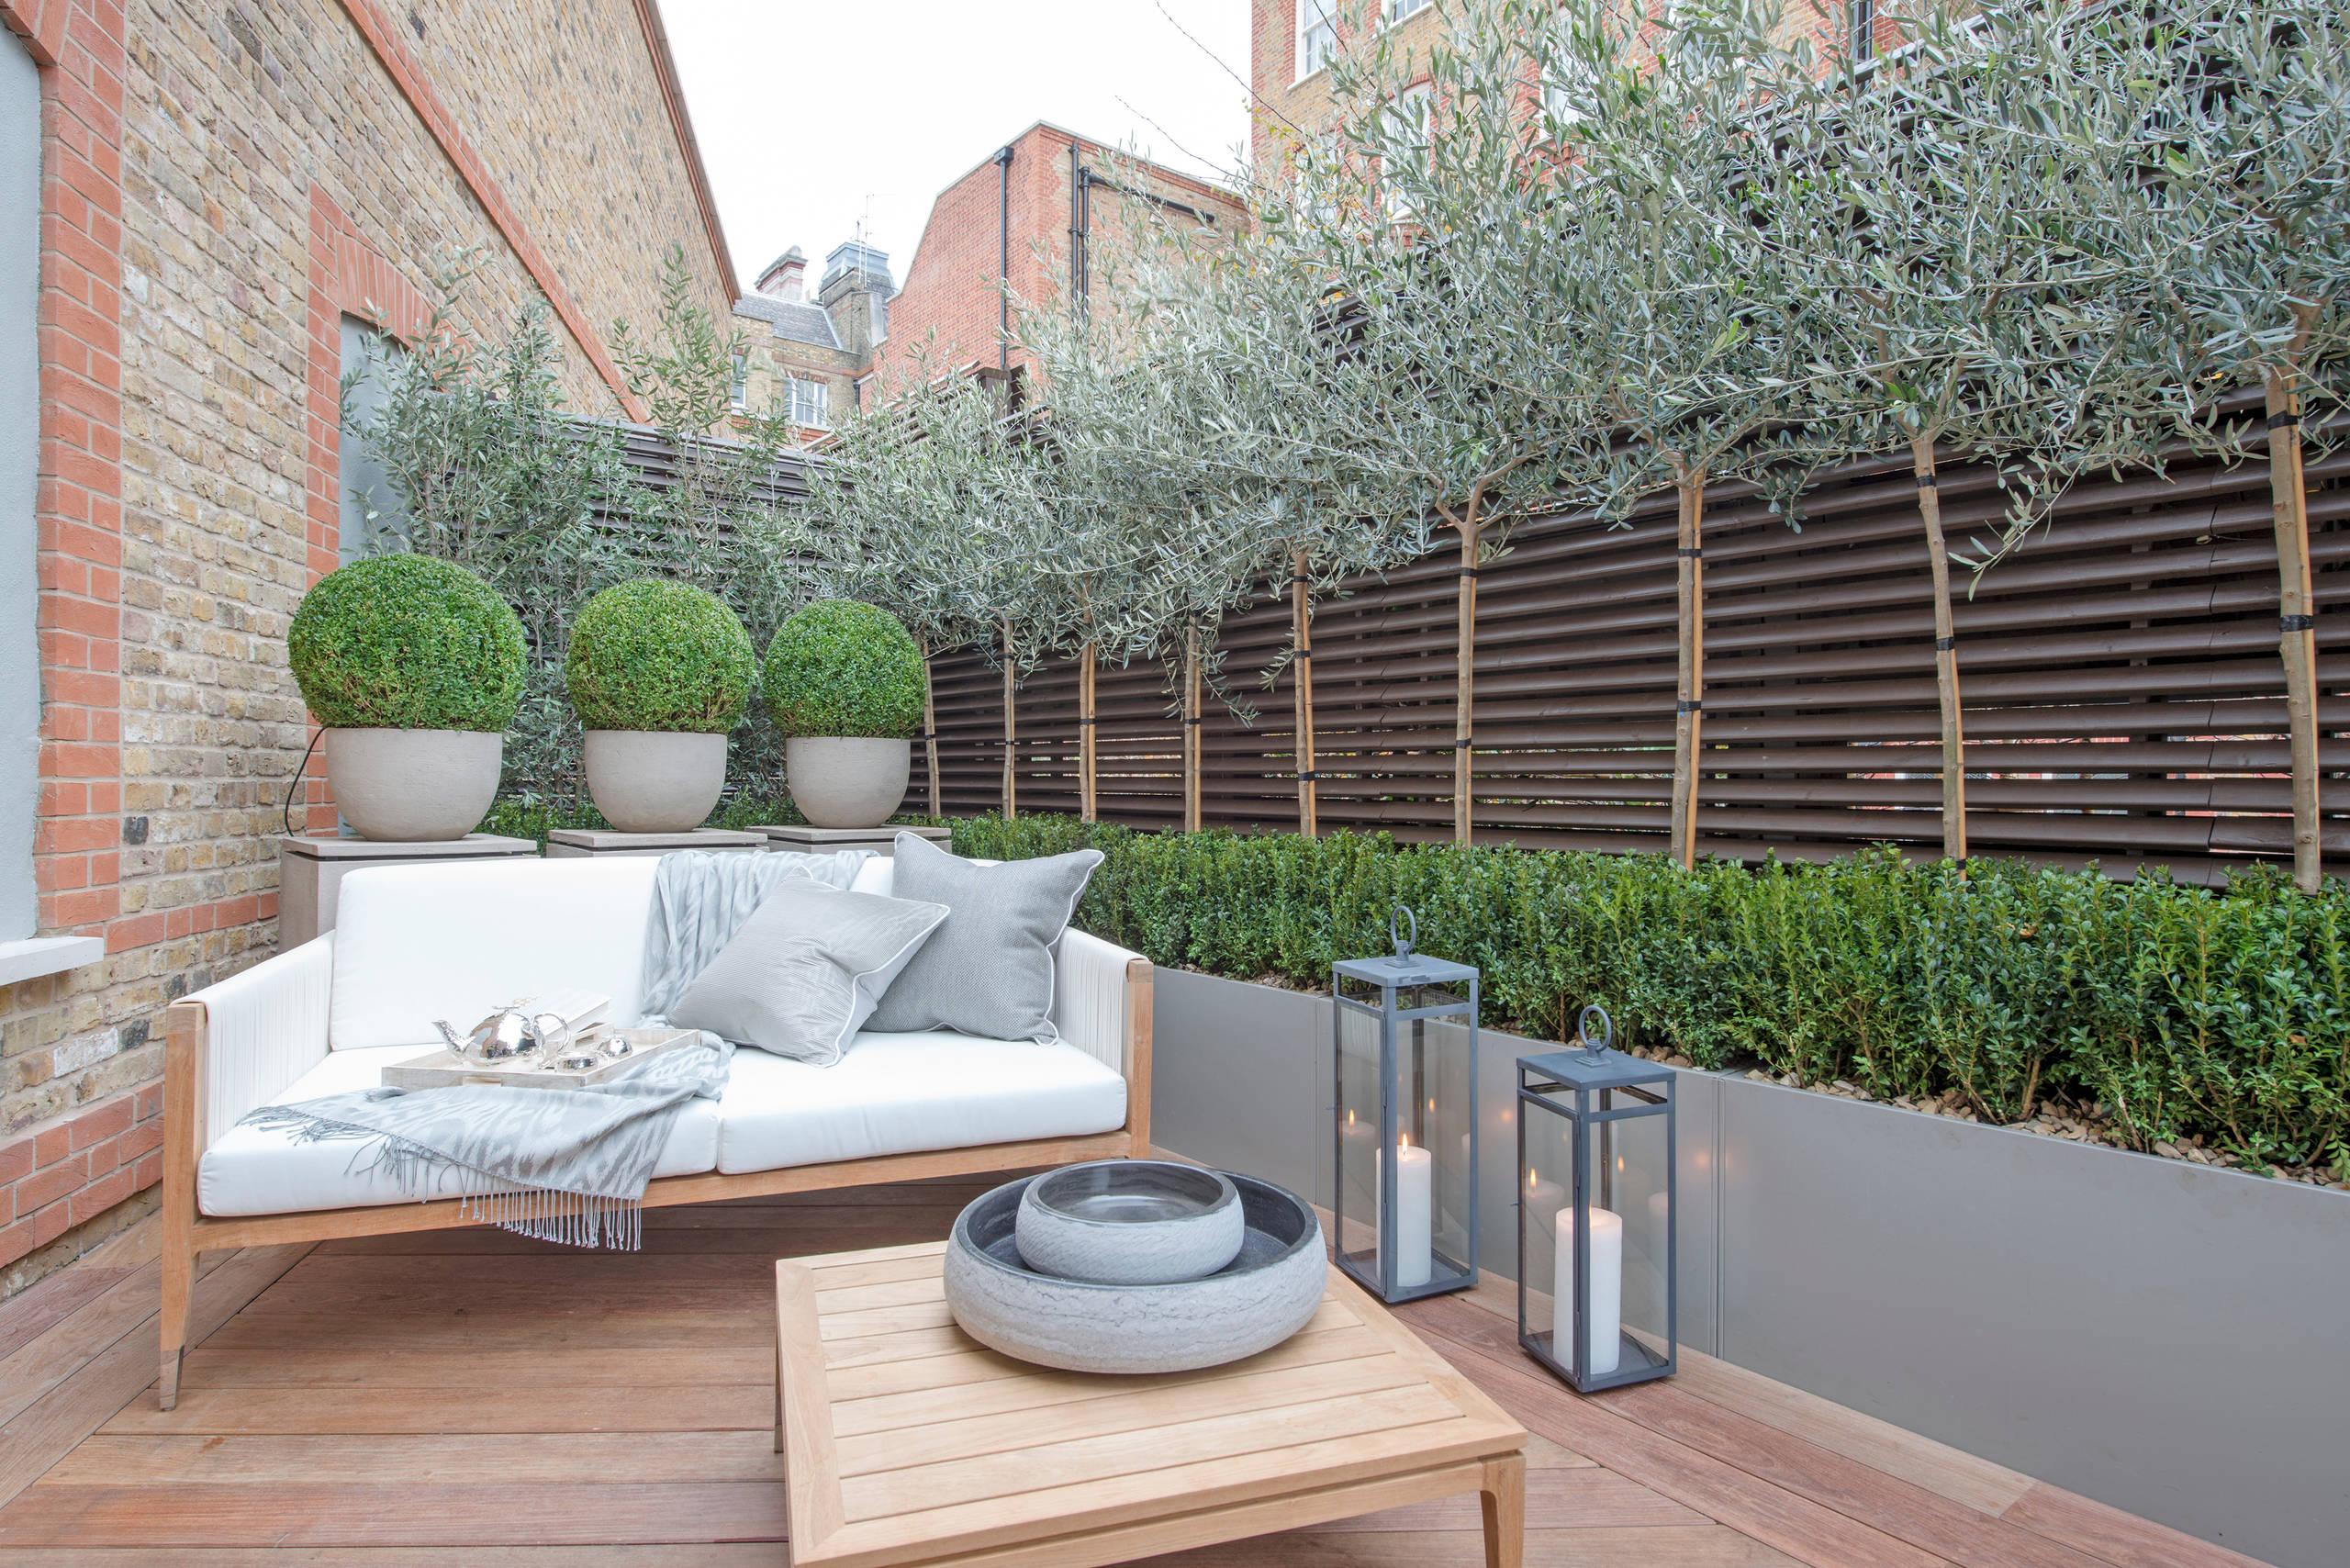 75 Beautiful Small Backyard Deck Pictures Ideas November 2020 Houzz